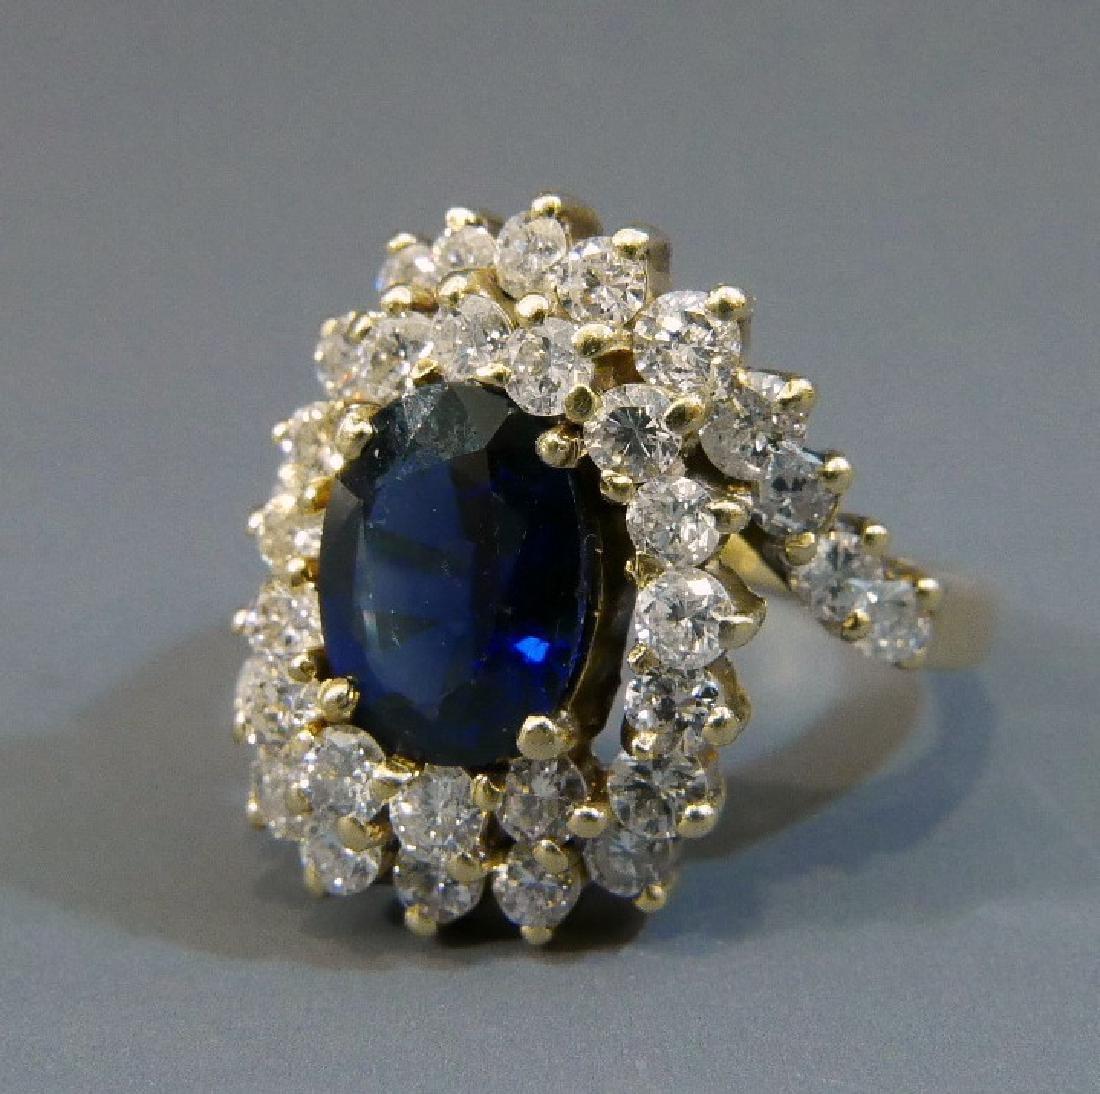 STUNNING 14K GOLD NATURAL SAPPHIRE & DIAMOND RING